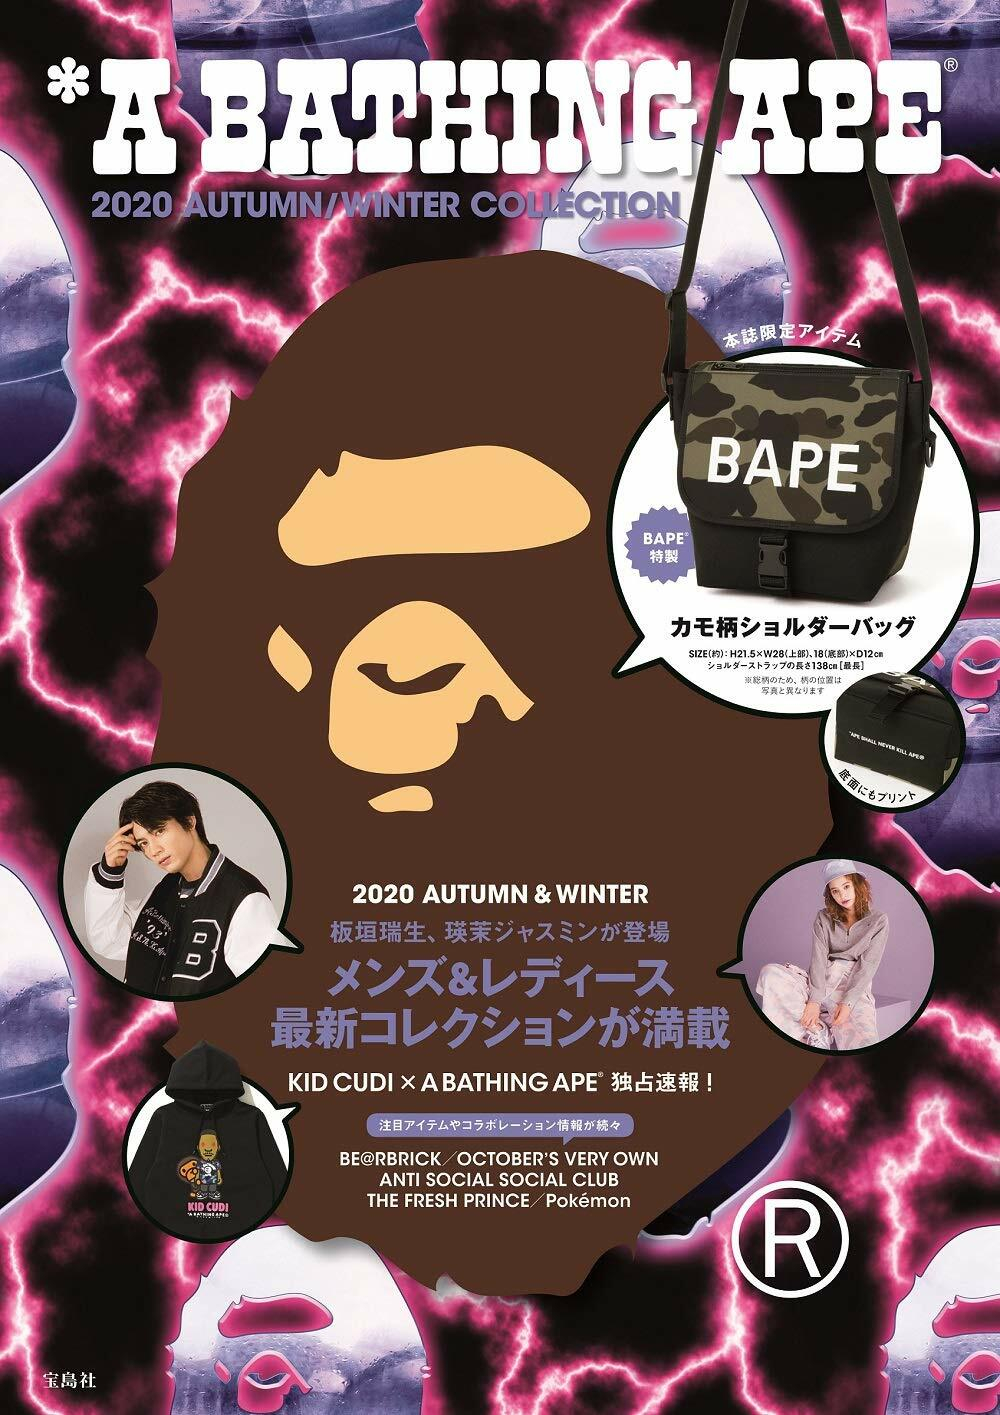 A BATHING APE® 2020 AUTUMN/WINTER COLLECTION (e-MOOK 寶島社ブランドムック)